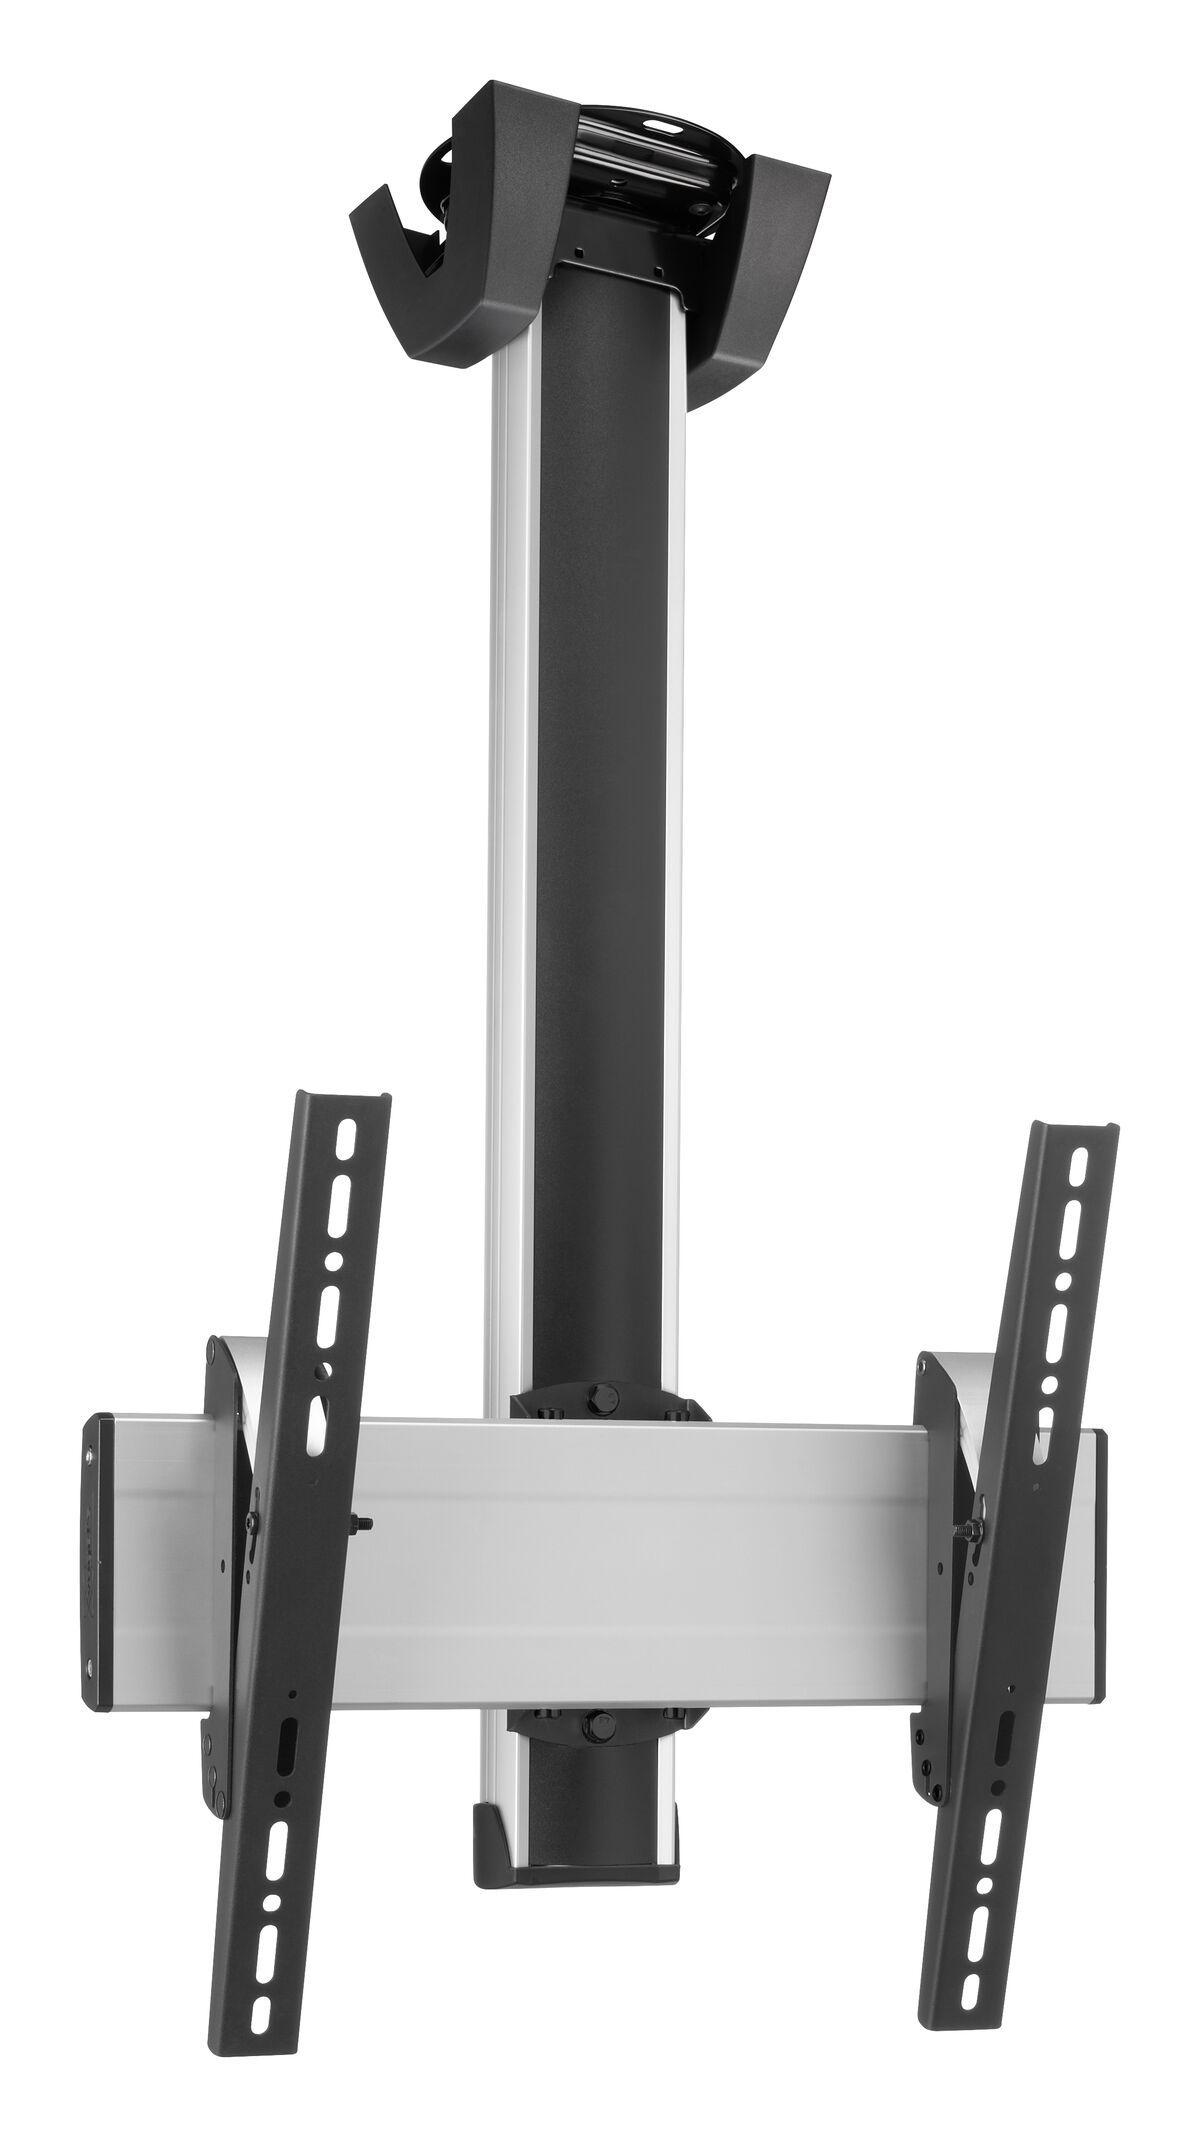 Vogel's CT1544S Support plafond pivotante - Product